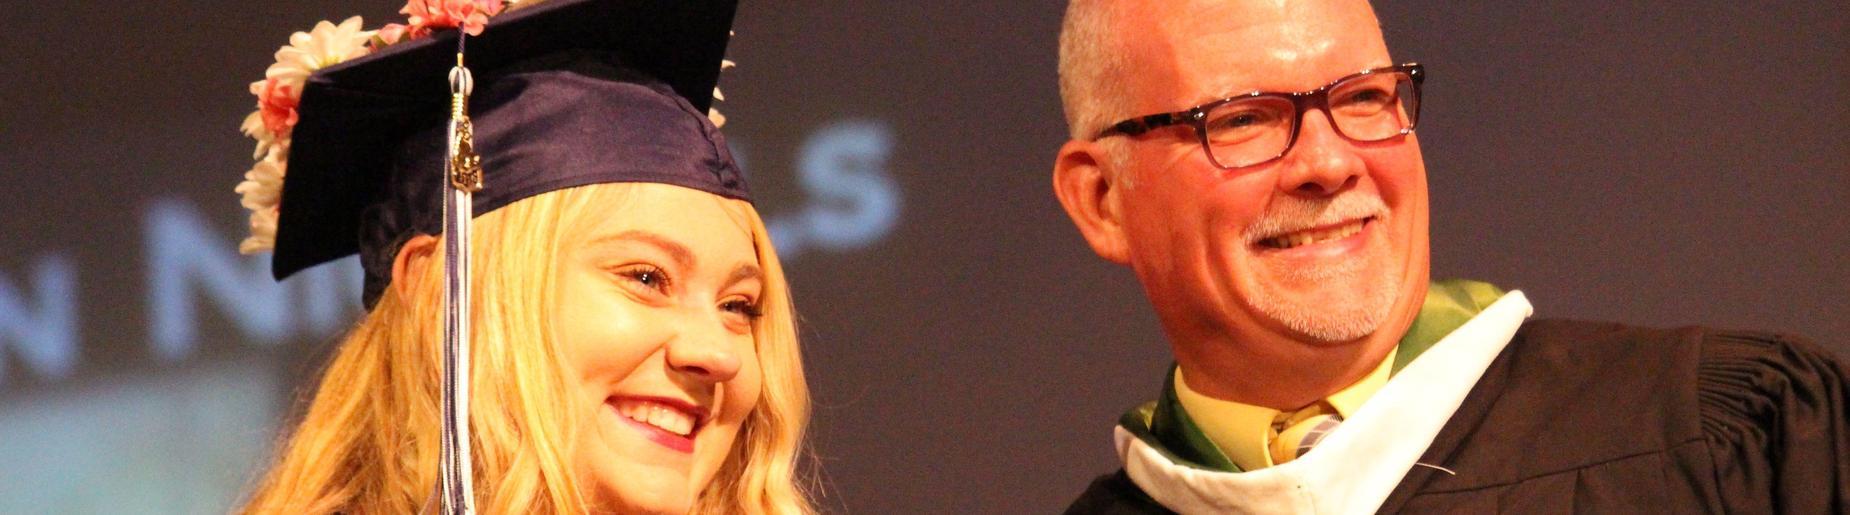 graduates and Mr. Mahoney